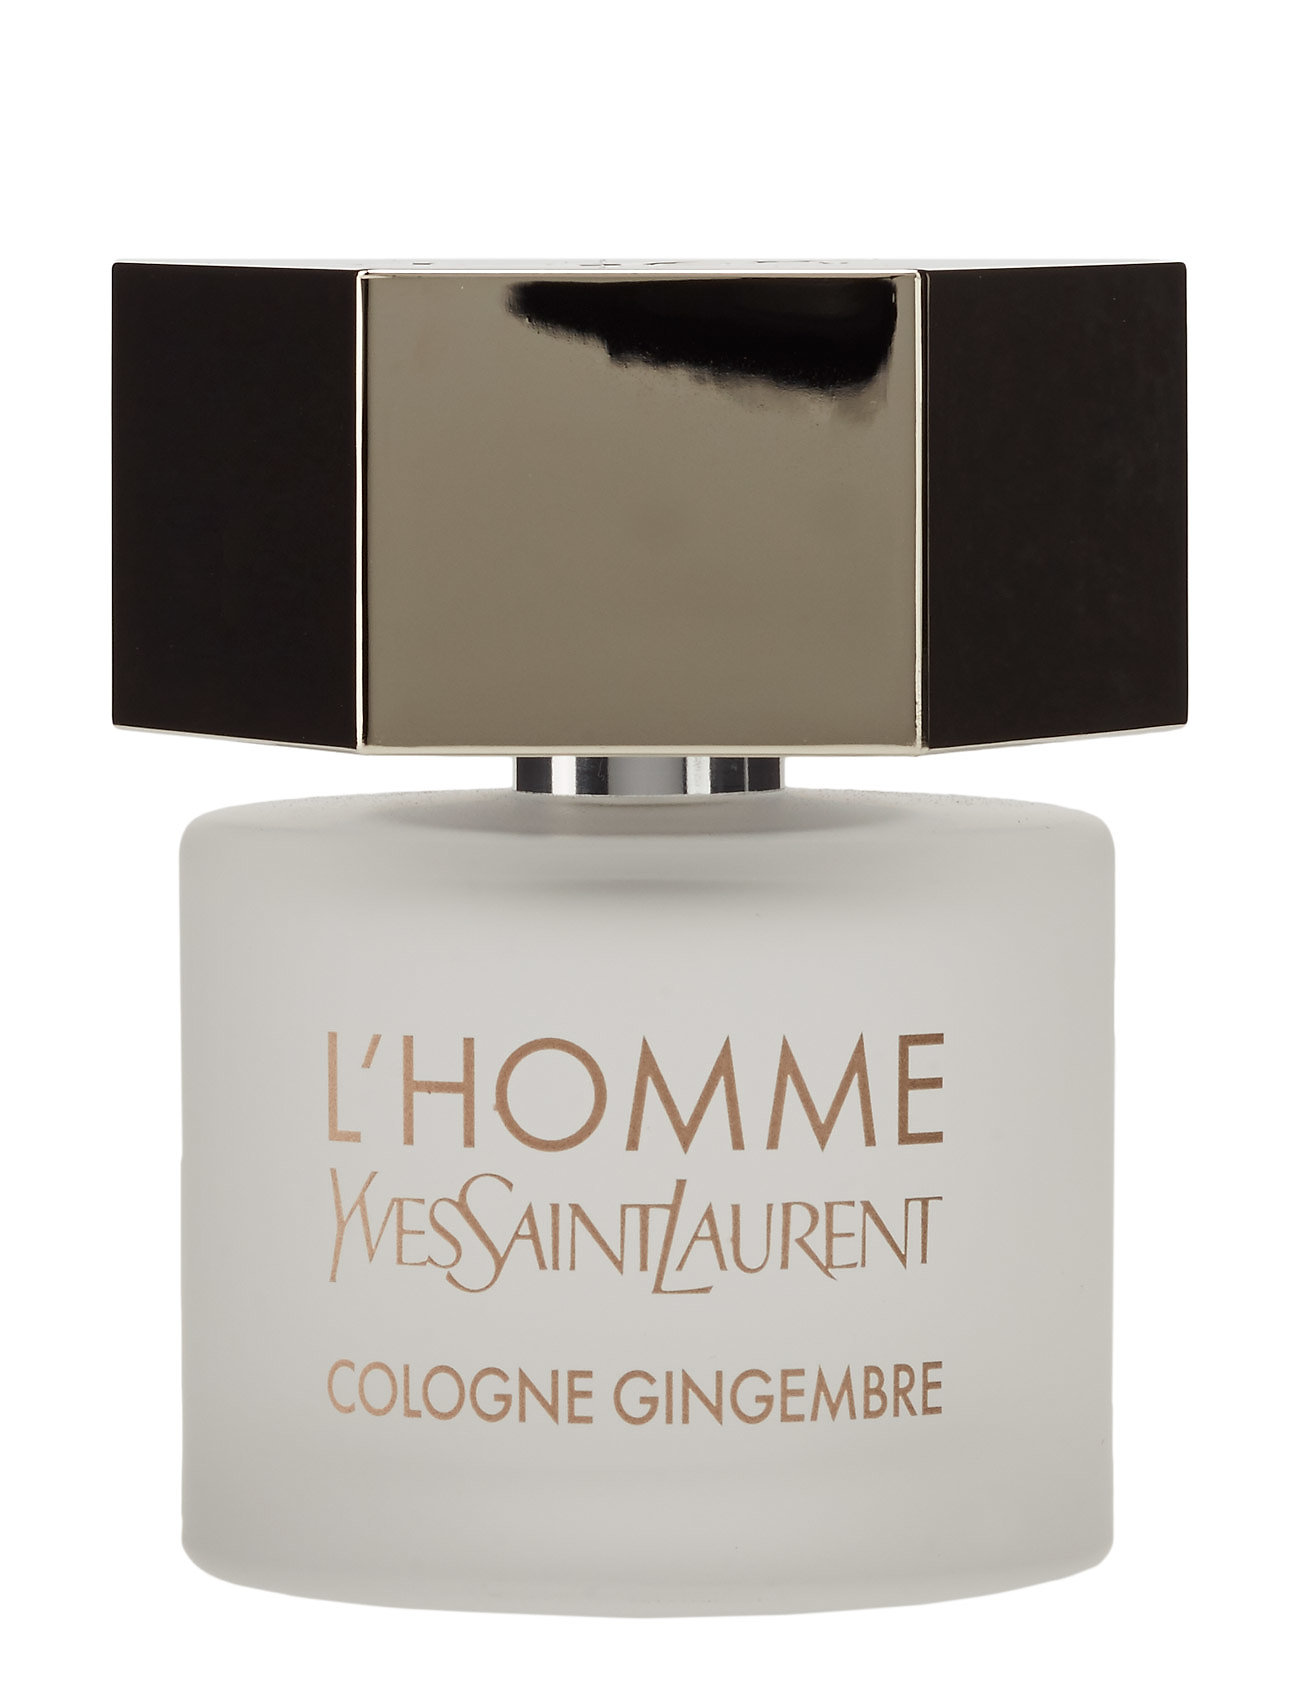 yves saint laurent – Lâ´homme gingembre cologne 60 ml. fra boozt.com dk